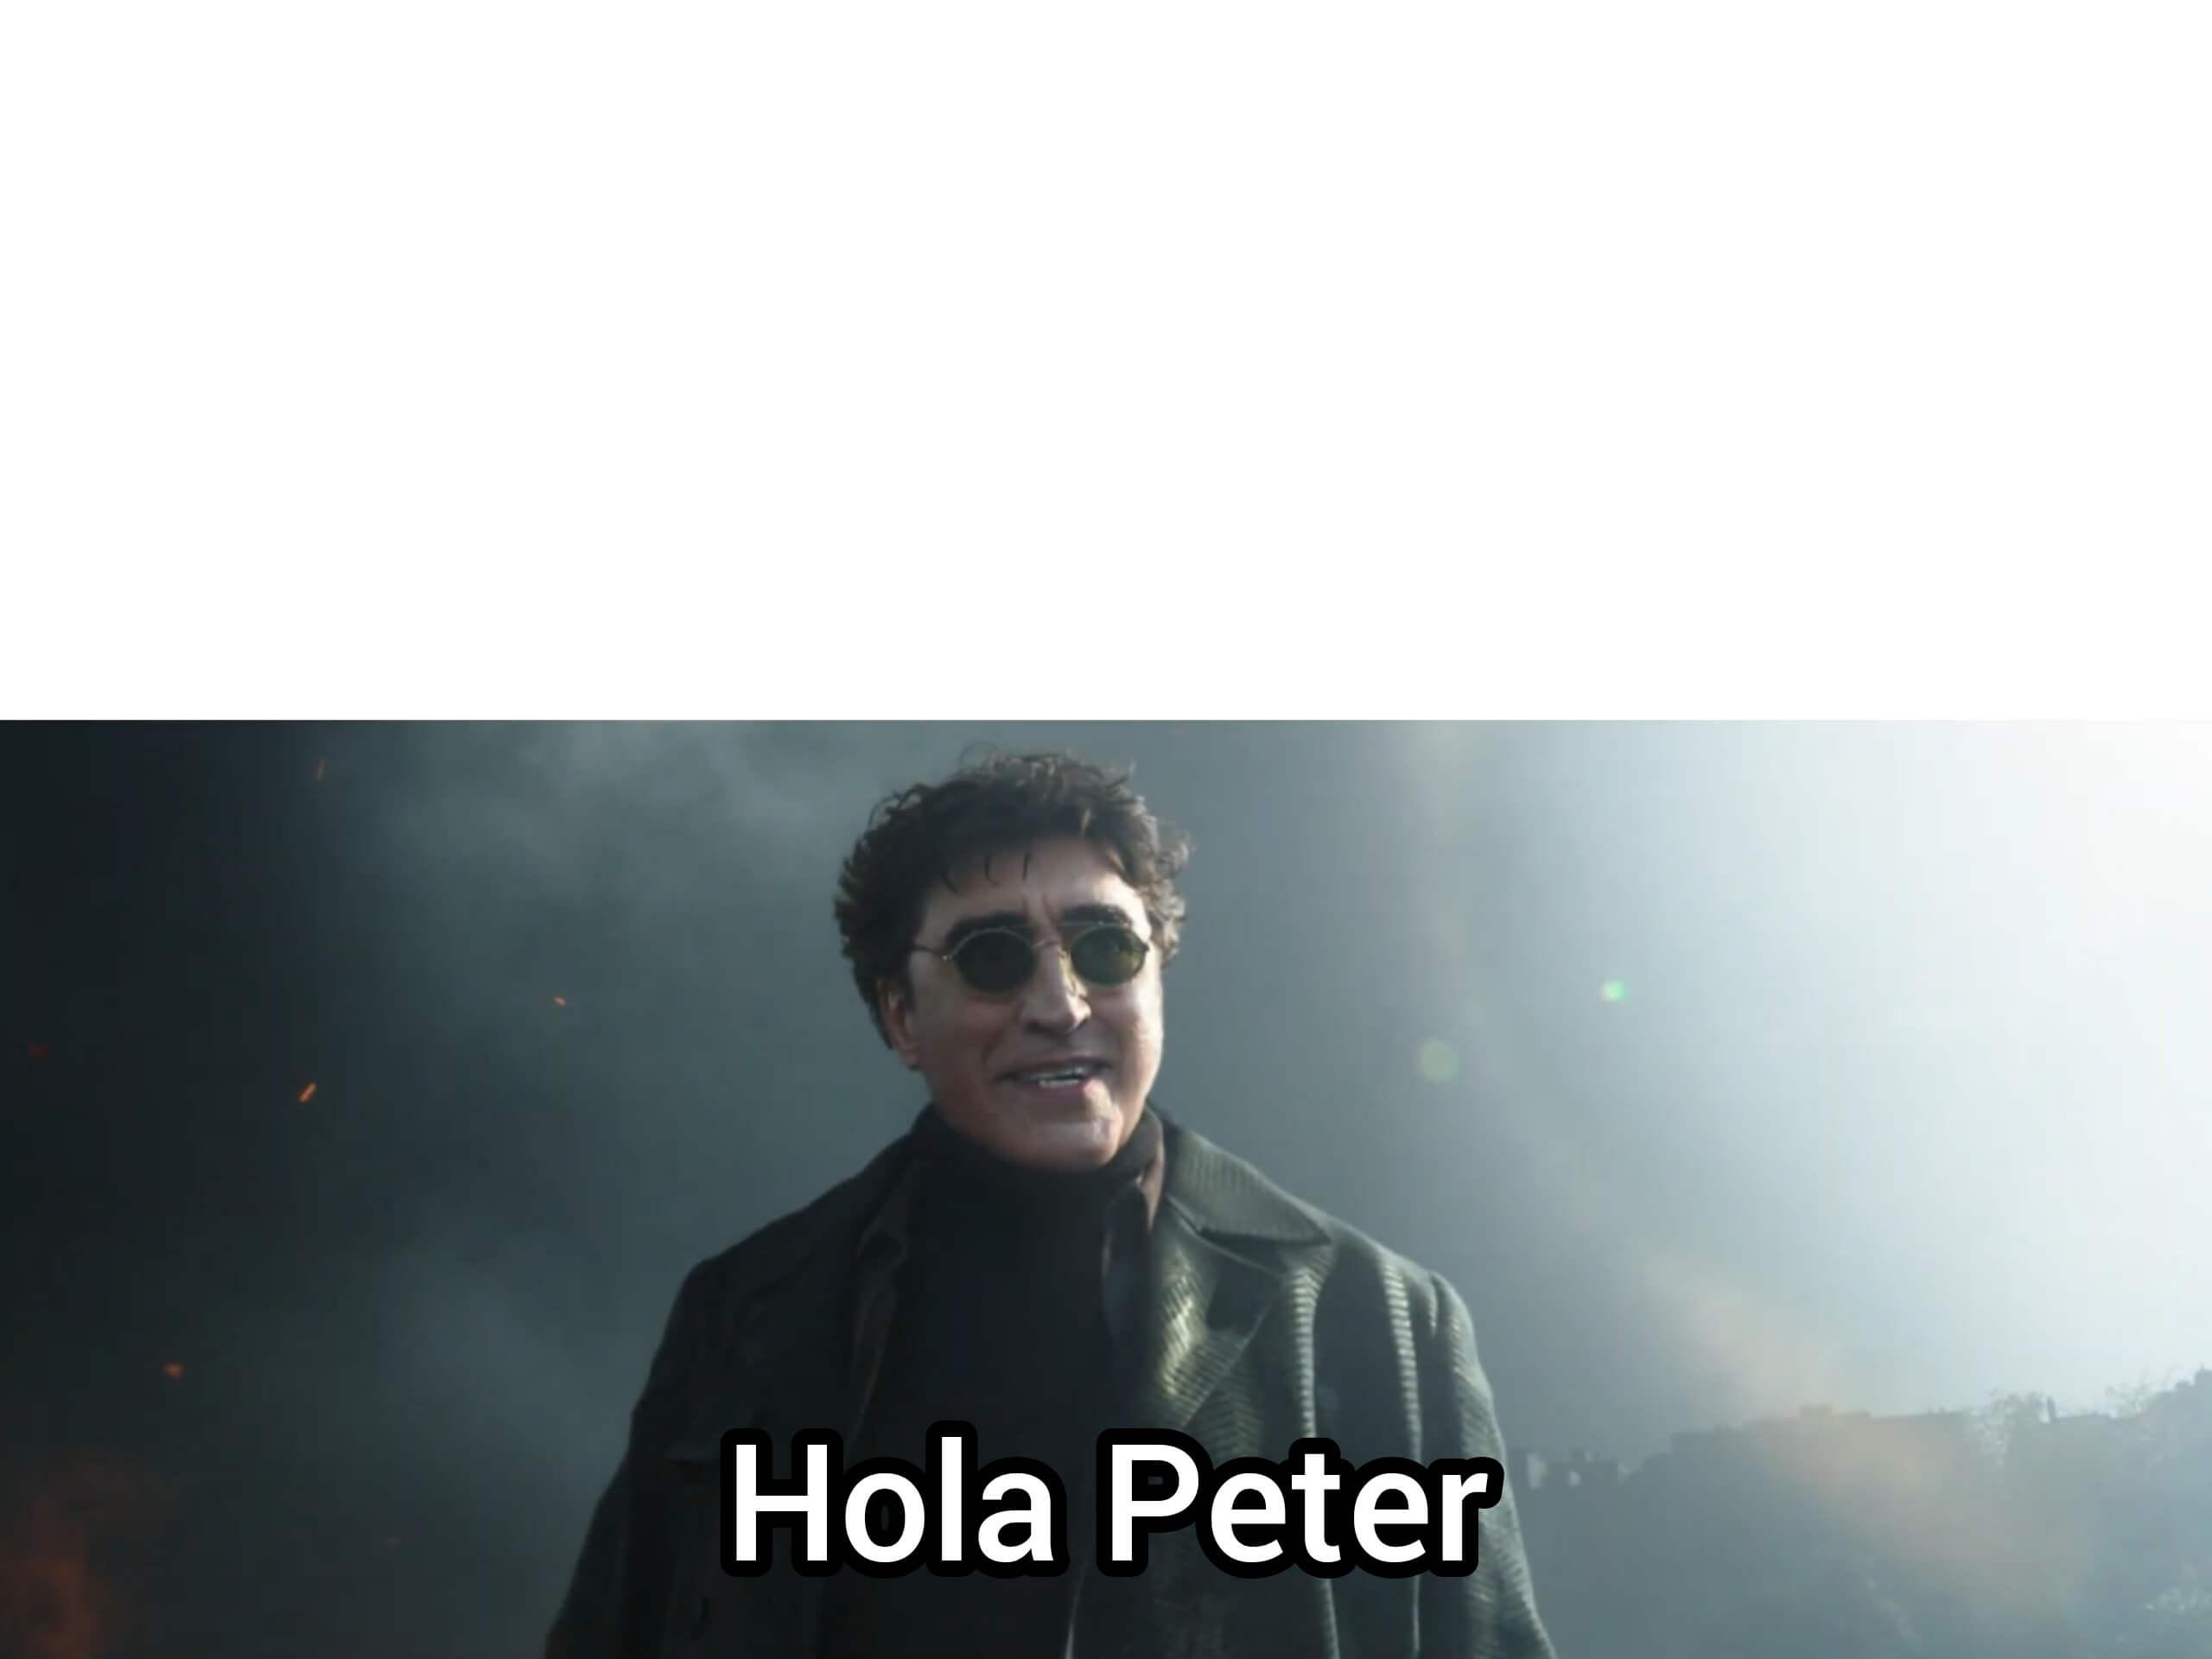 Ir a la pagina de la plantilla Hola Peter.